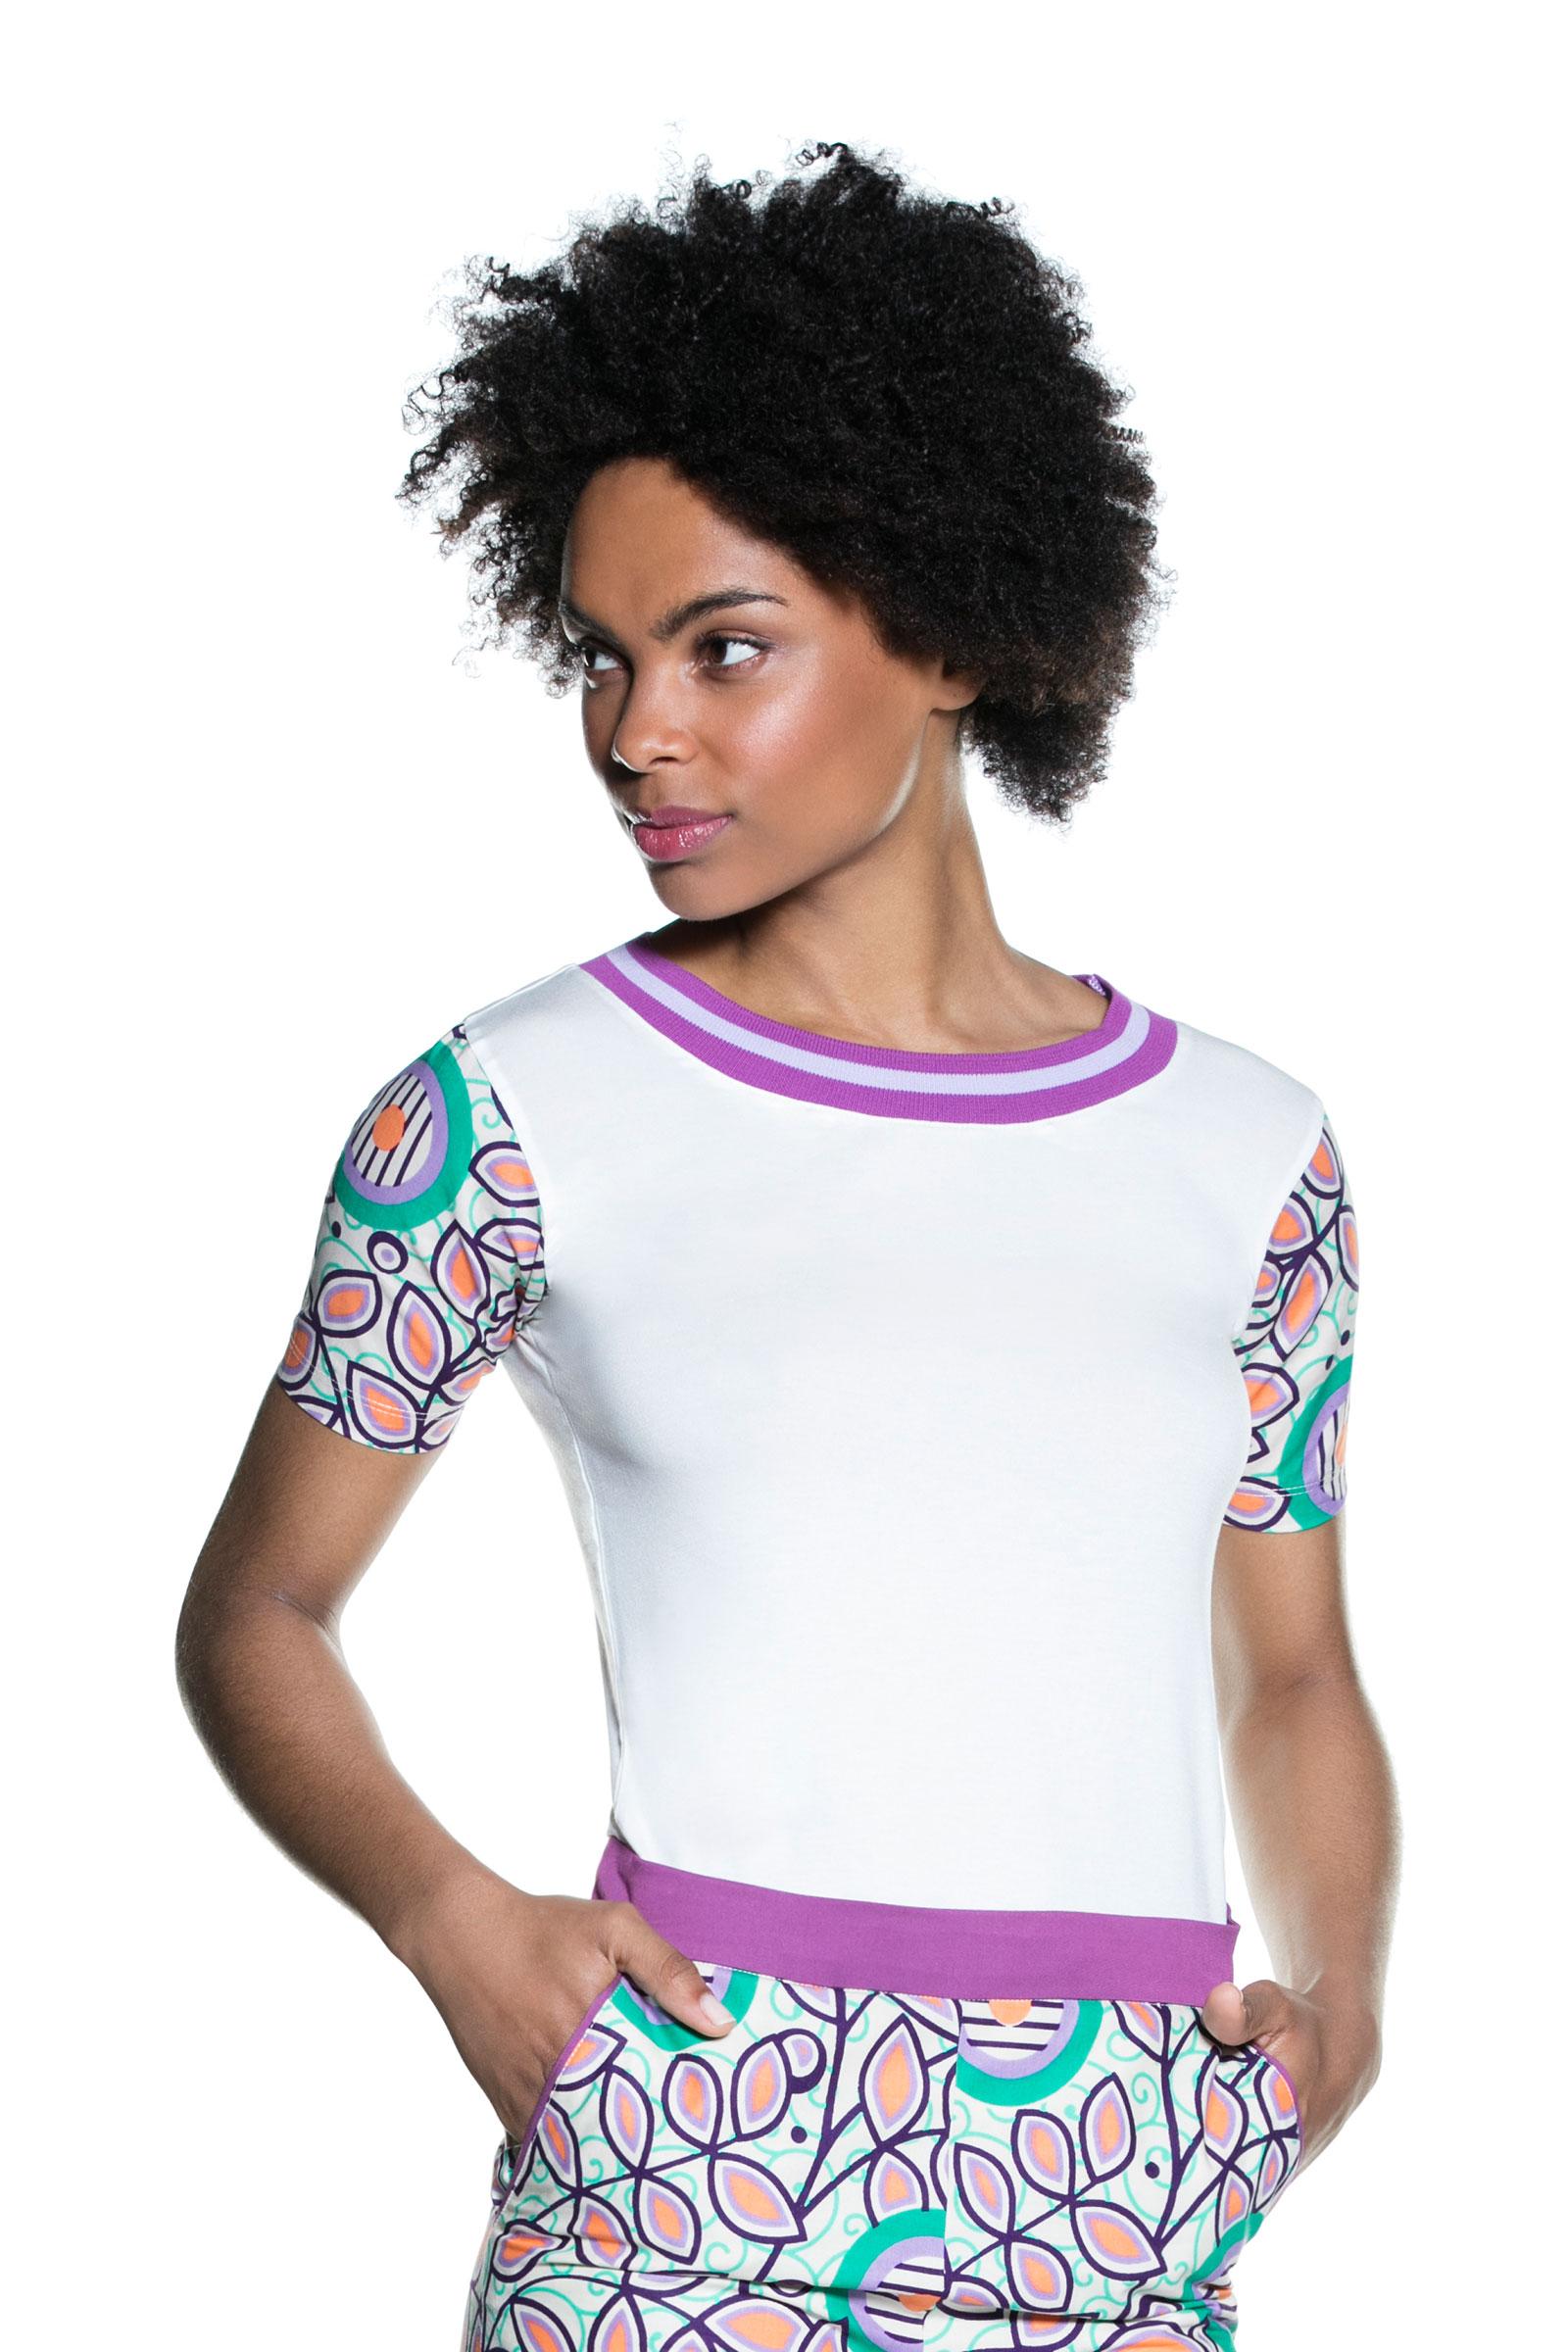 t-shirt_floral.jpg